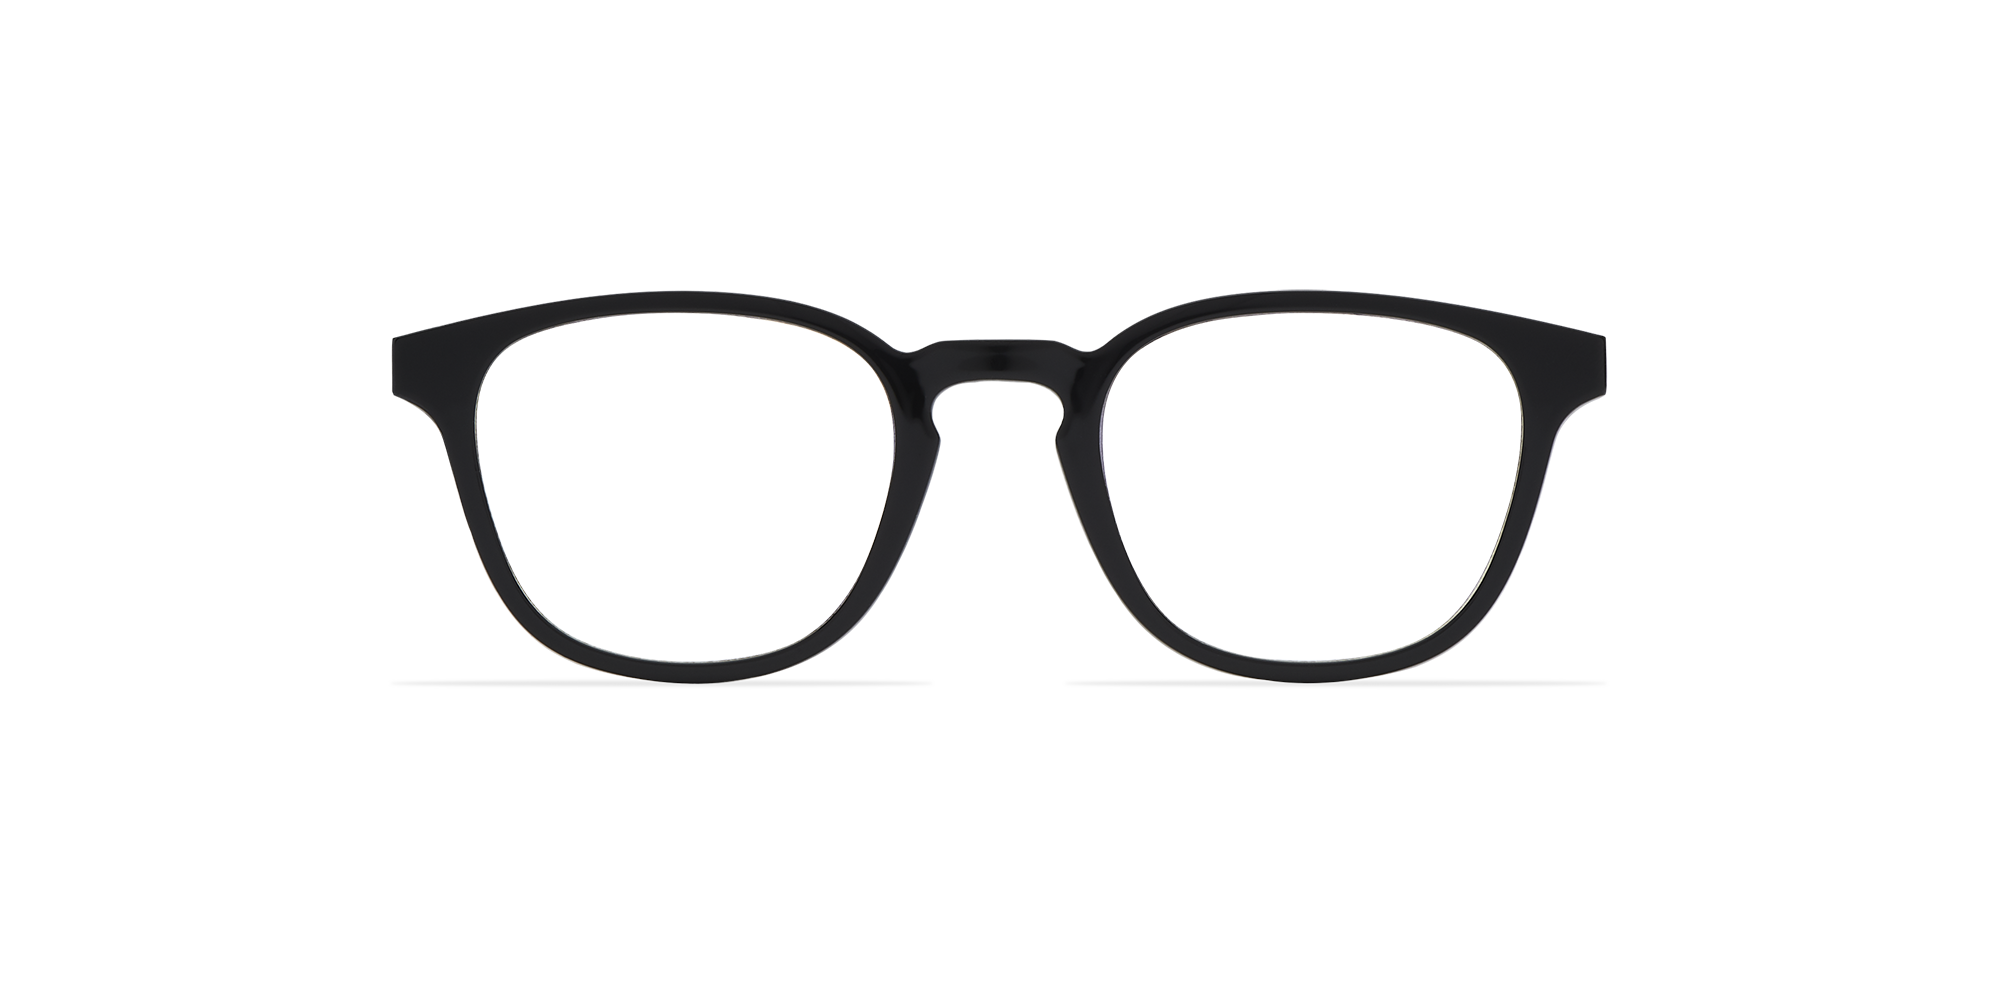 afflelou/france/products/smart_clip/clips_glasses/07630036429204_face.png